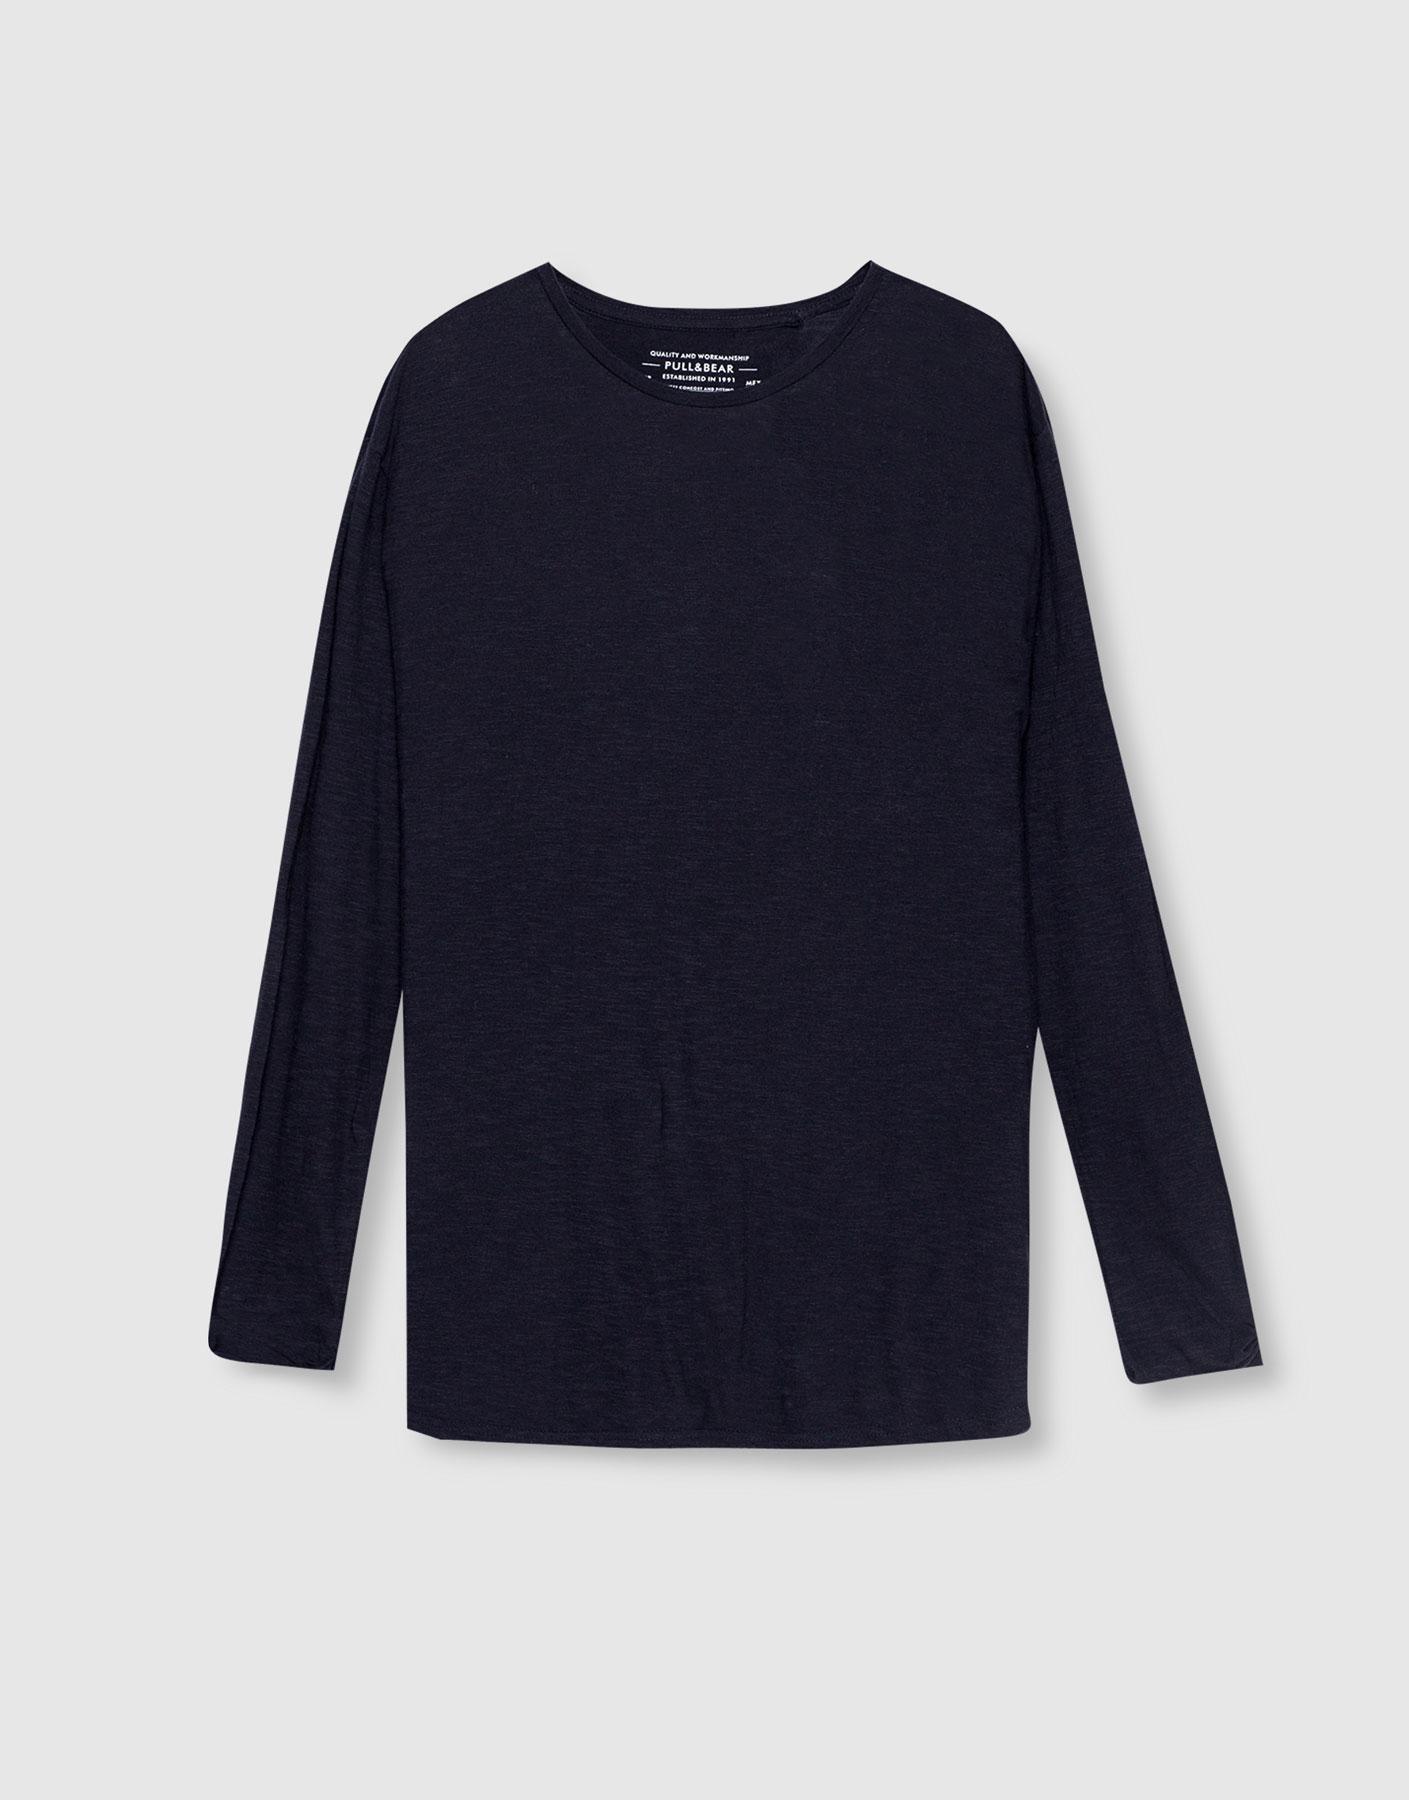 Basic long-sleeve t-shirt, £9.99 ( pullandbear.com )